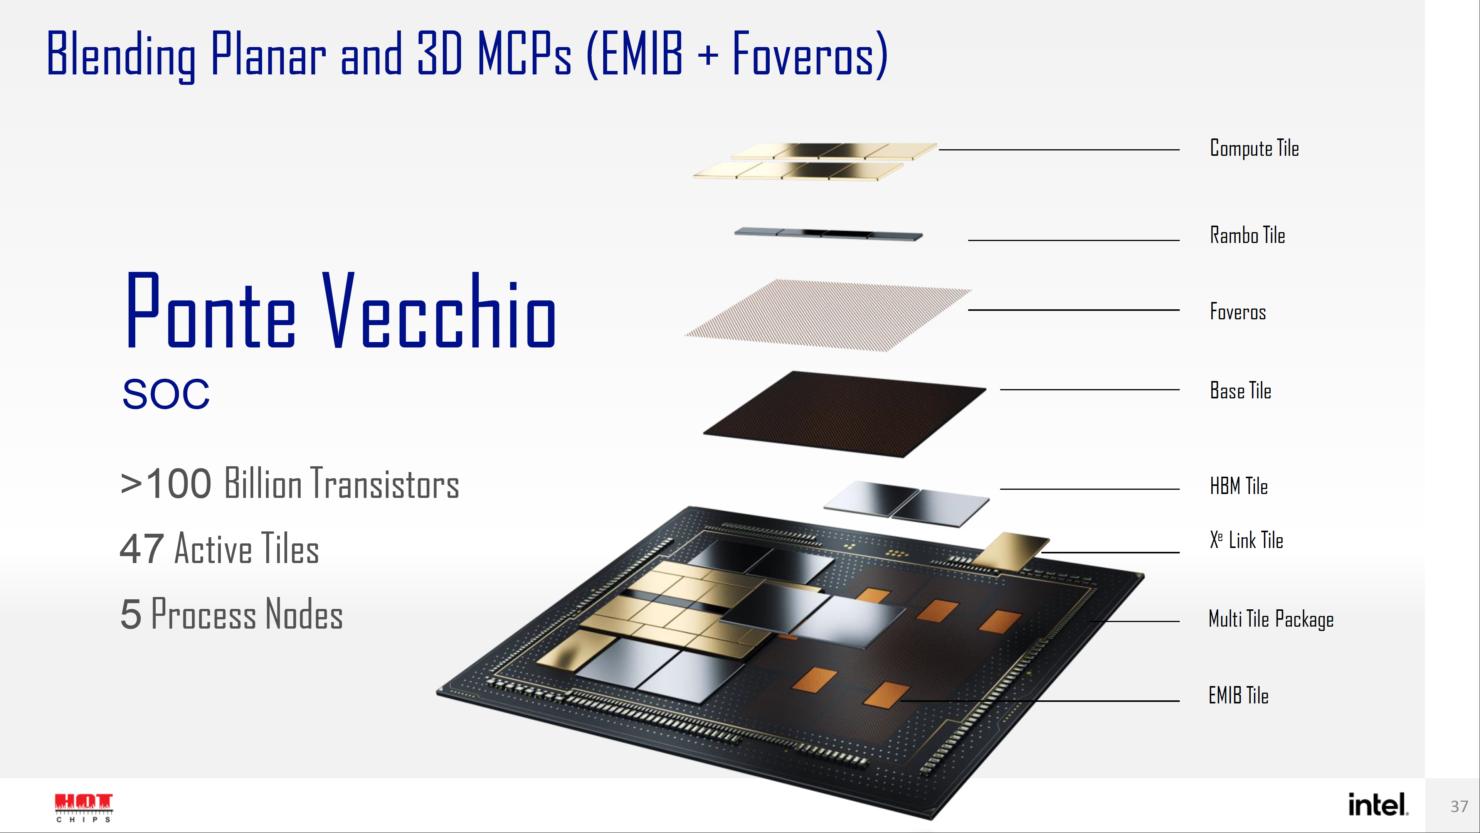 intel-sapphire-rapids-sp-xeon-hbm-cpu-ponte-vecchio-gpu-with-emib-forveros-packaging-technologies-_7